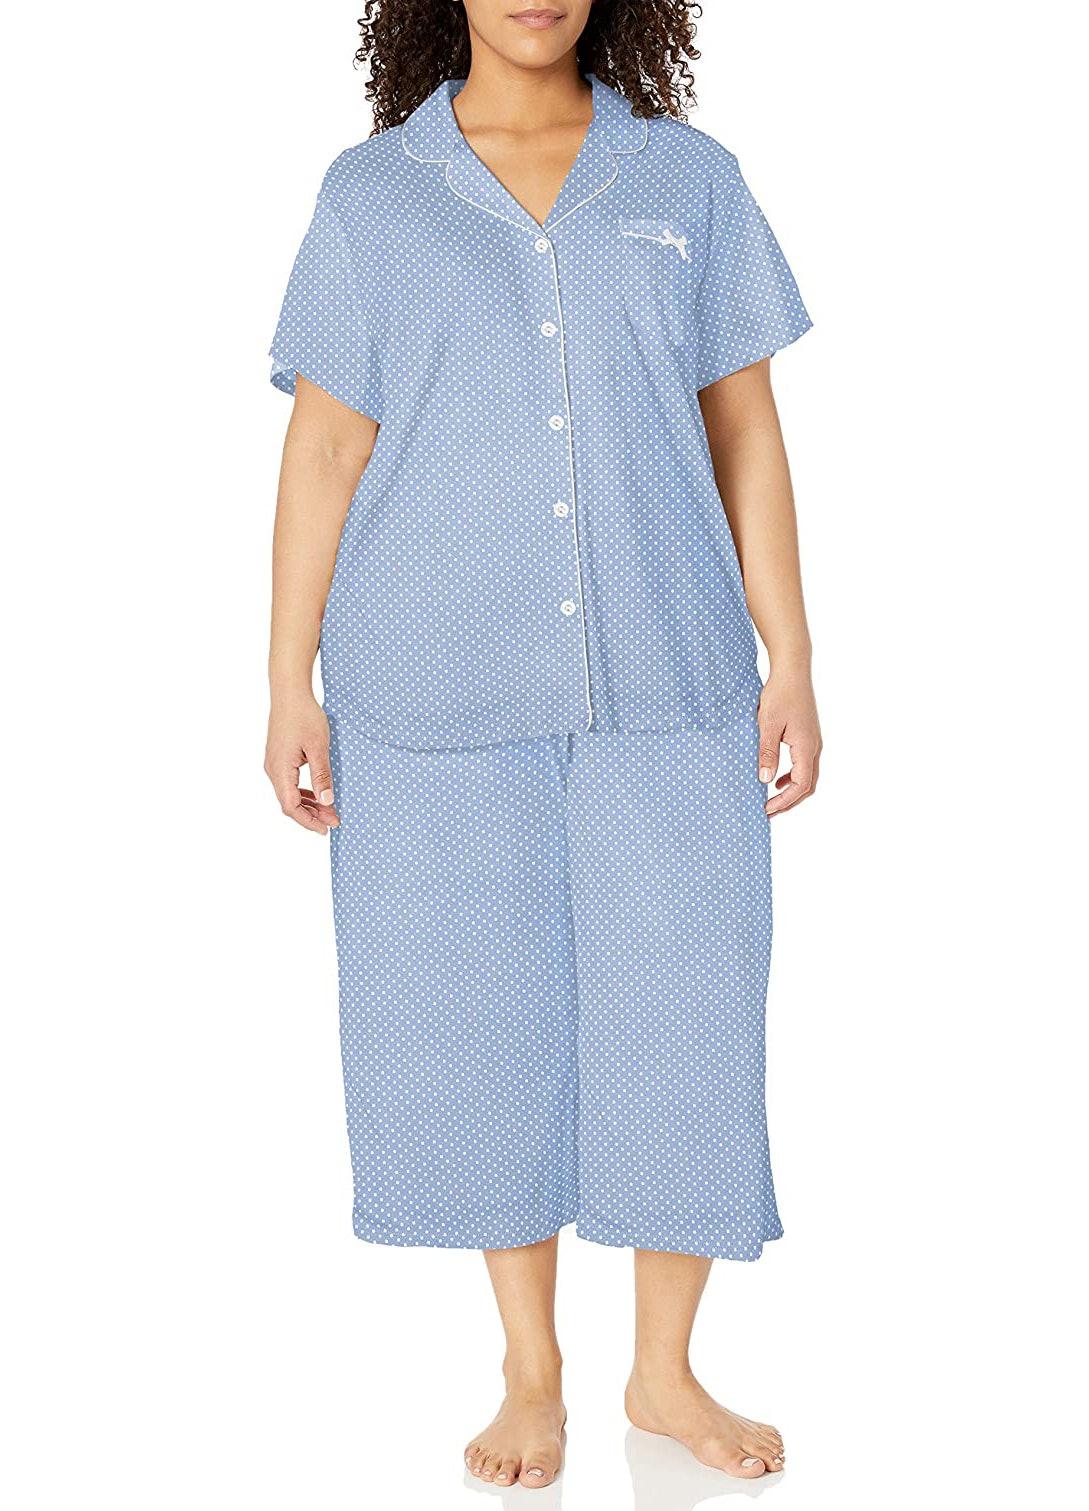 Karen Neuburger Womens Pajama Short Sleeve Pj Sleepdress Night Shirt